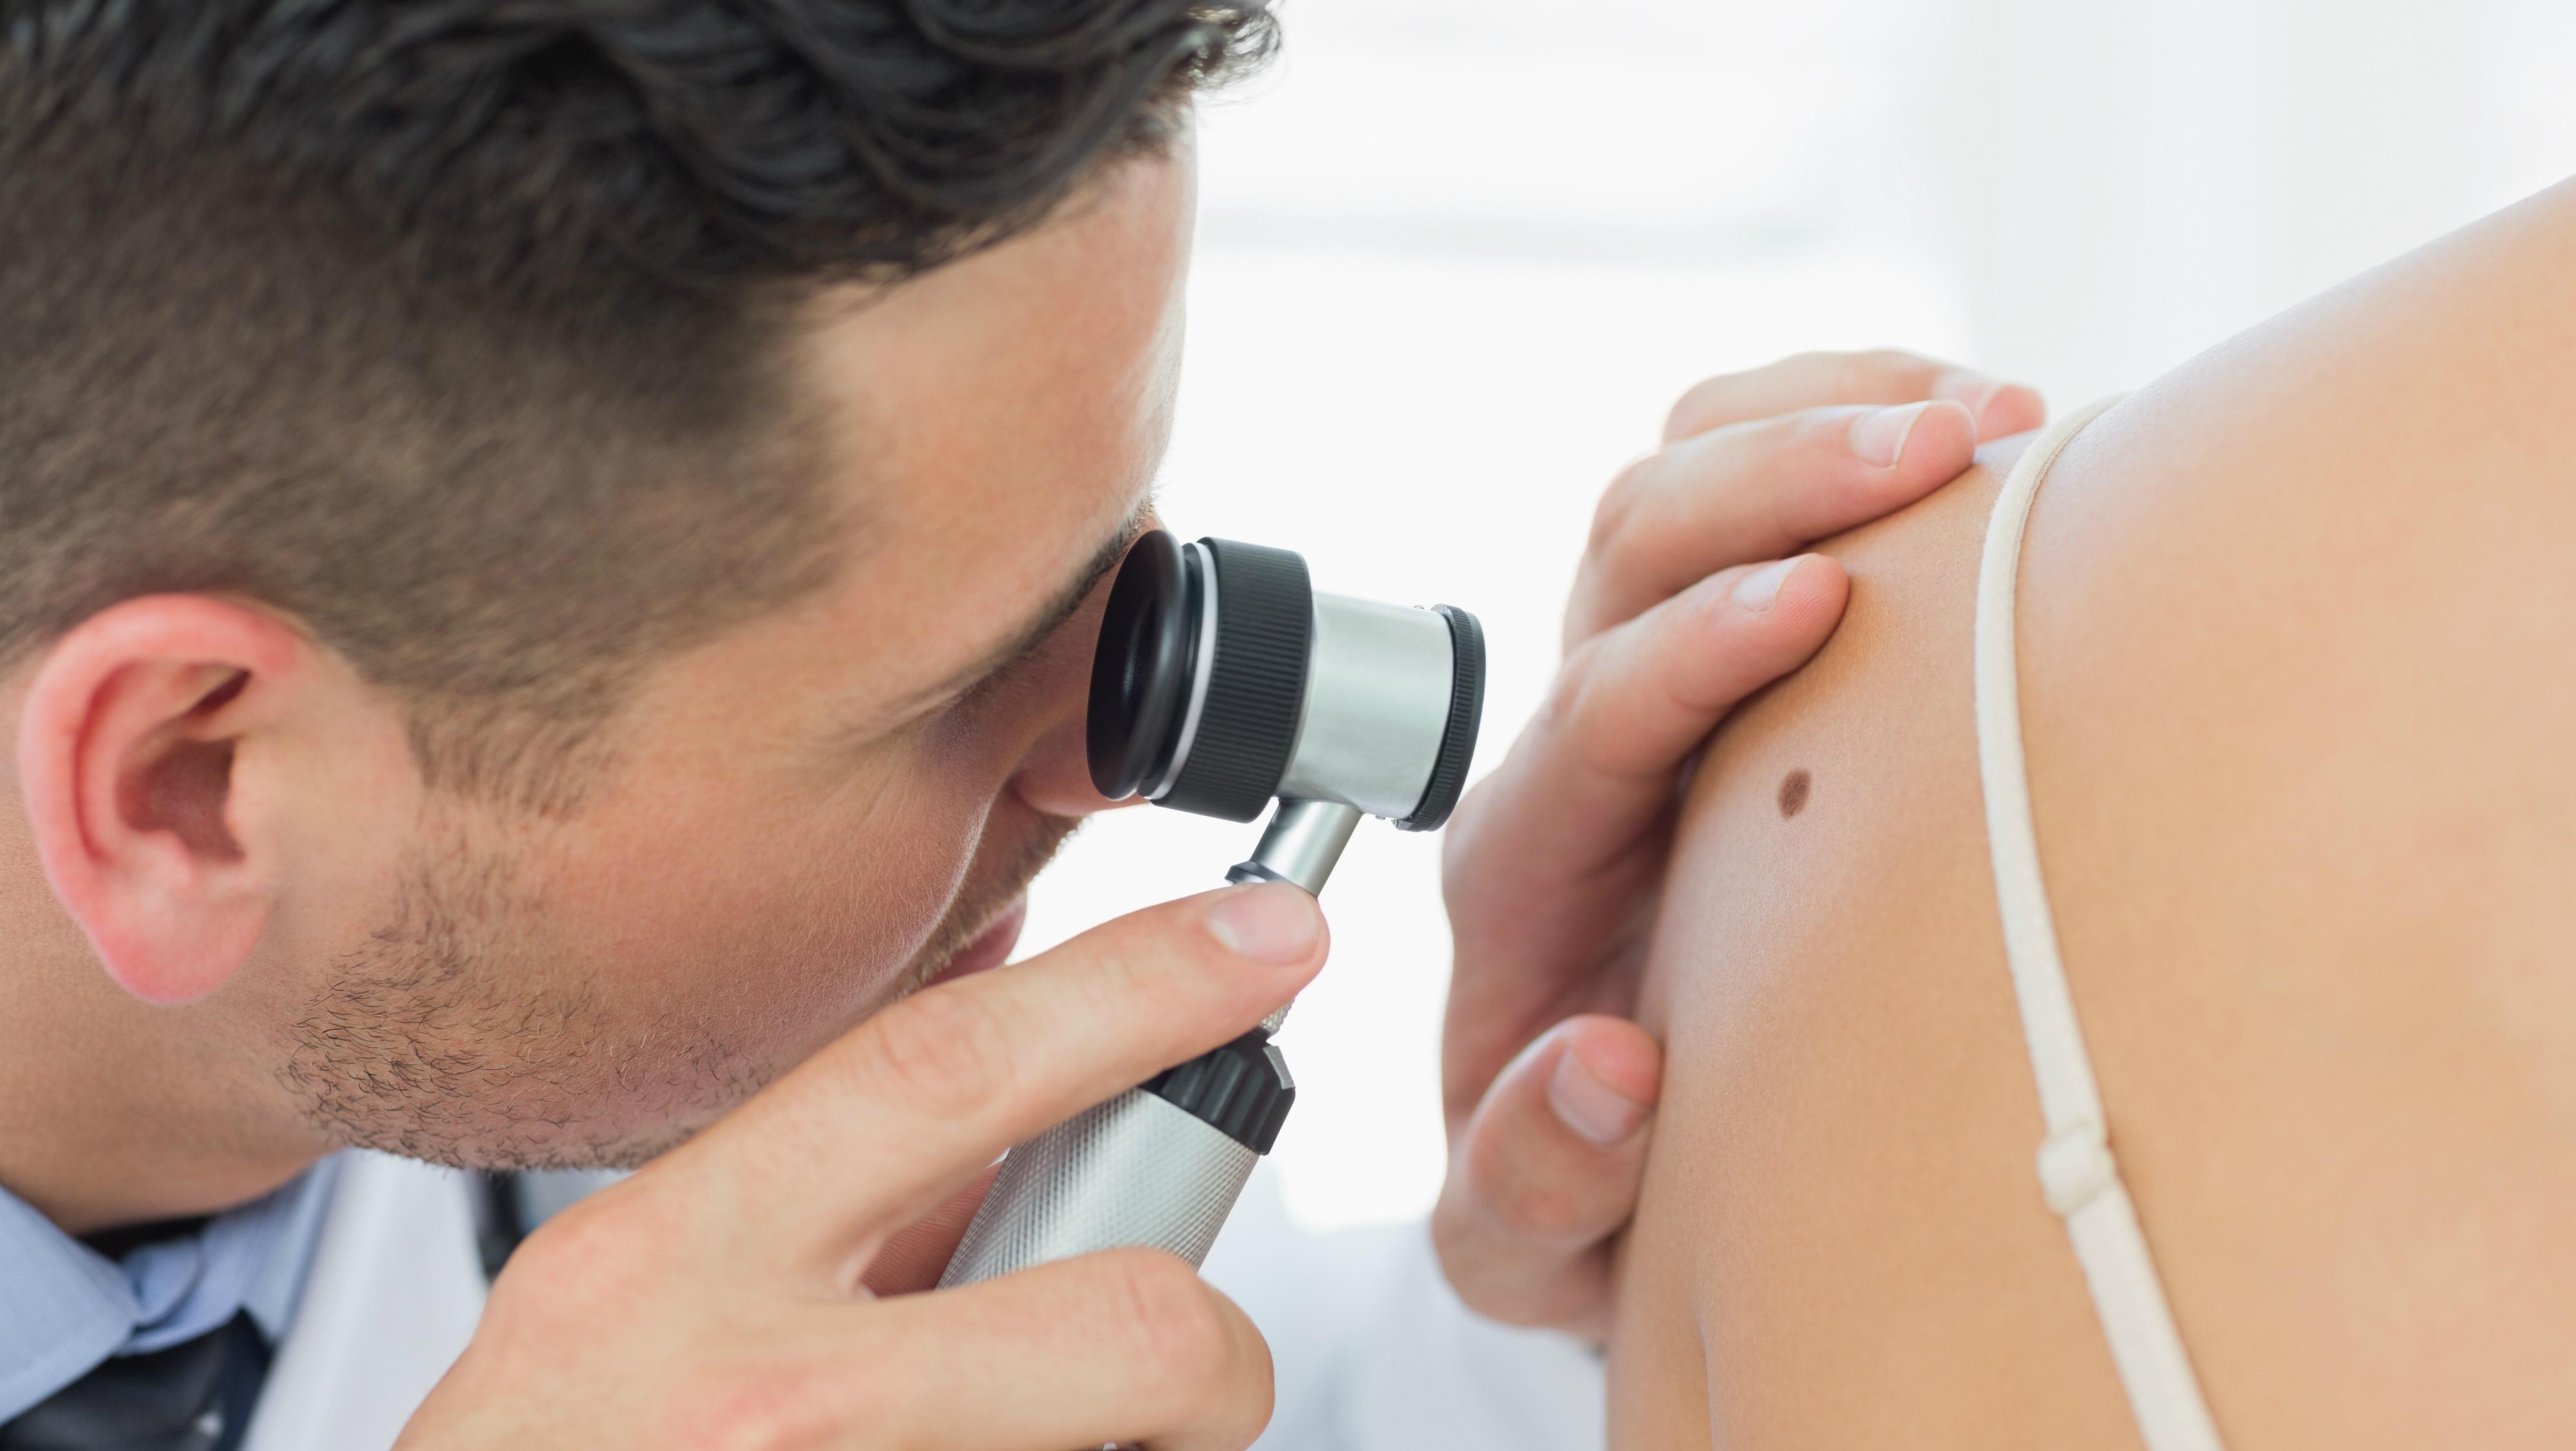 prevenir-el-cancer-de-piel-178428761